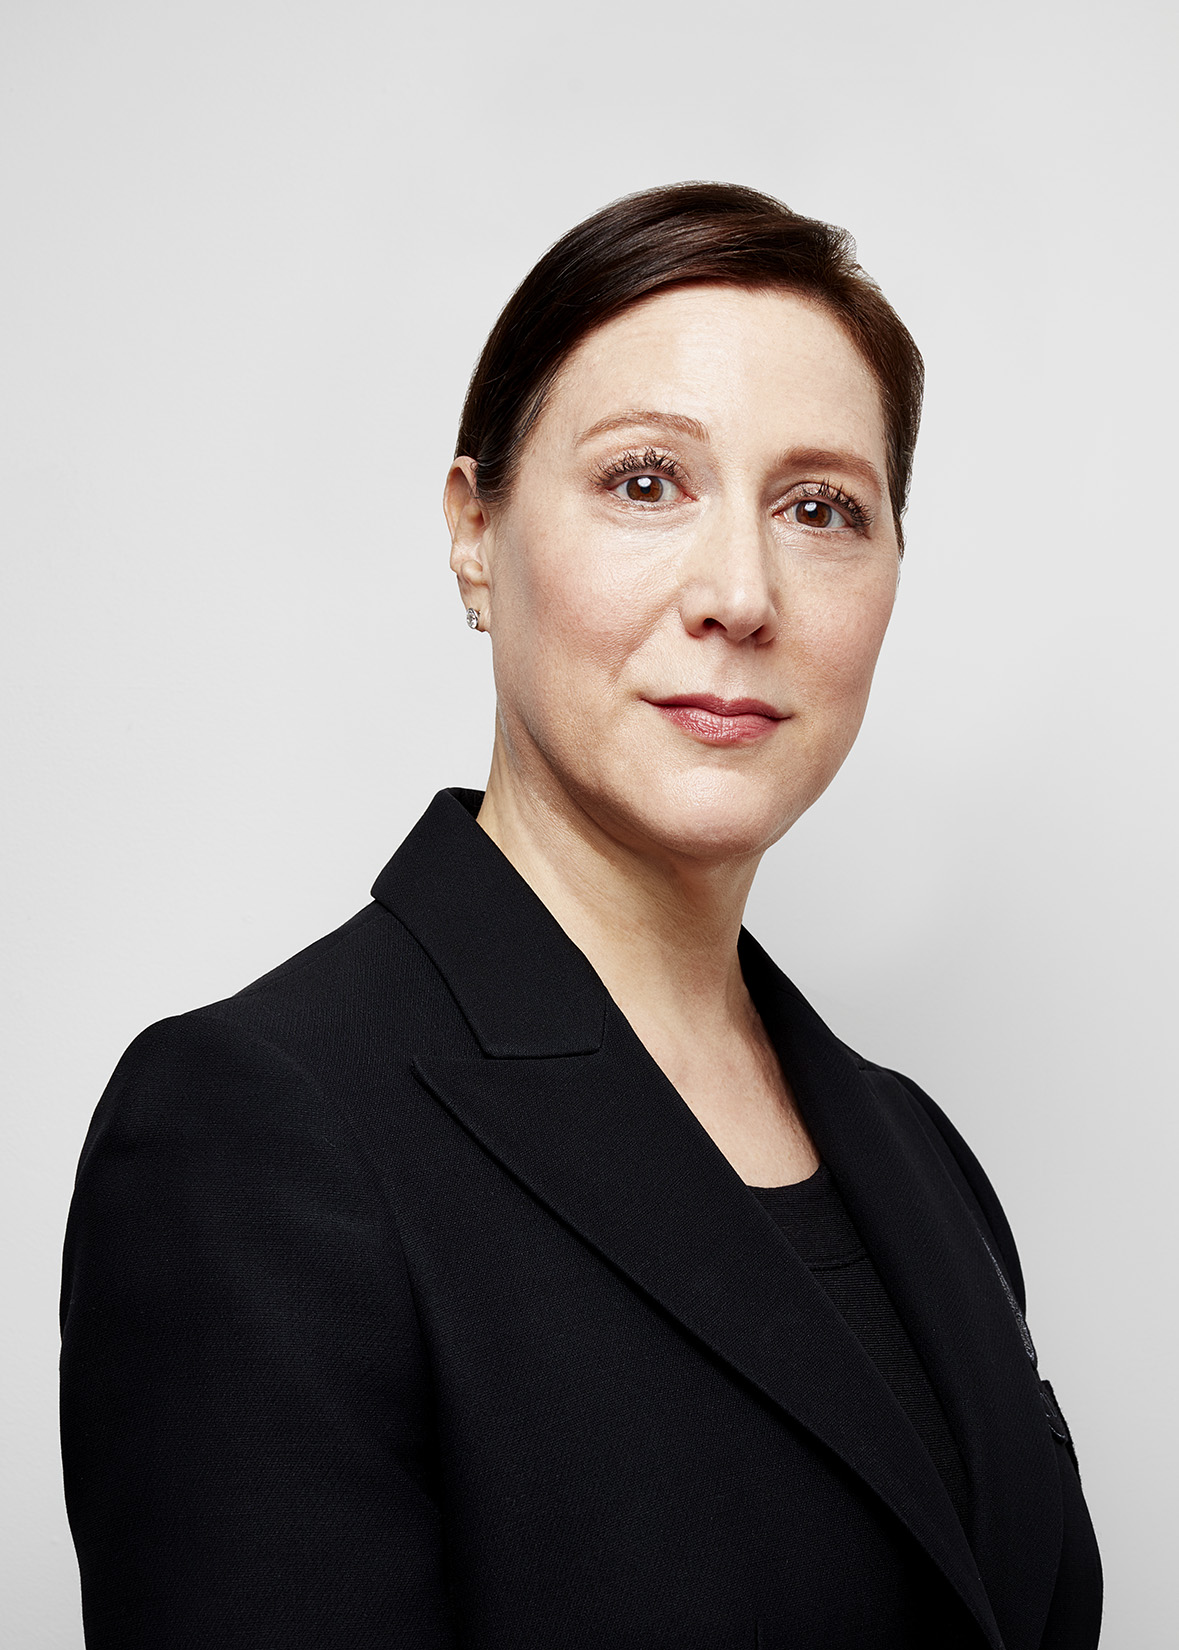 American Art Specialist Elizabeth Goldberg Joins Phillips in New York